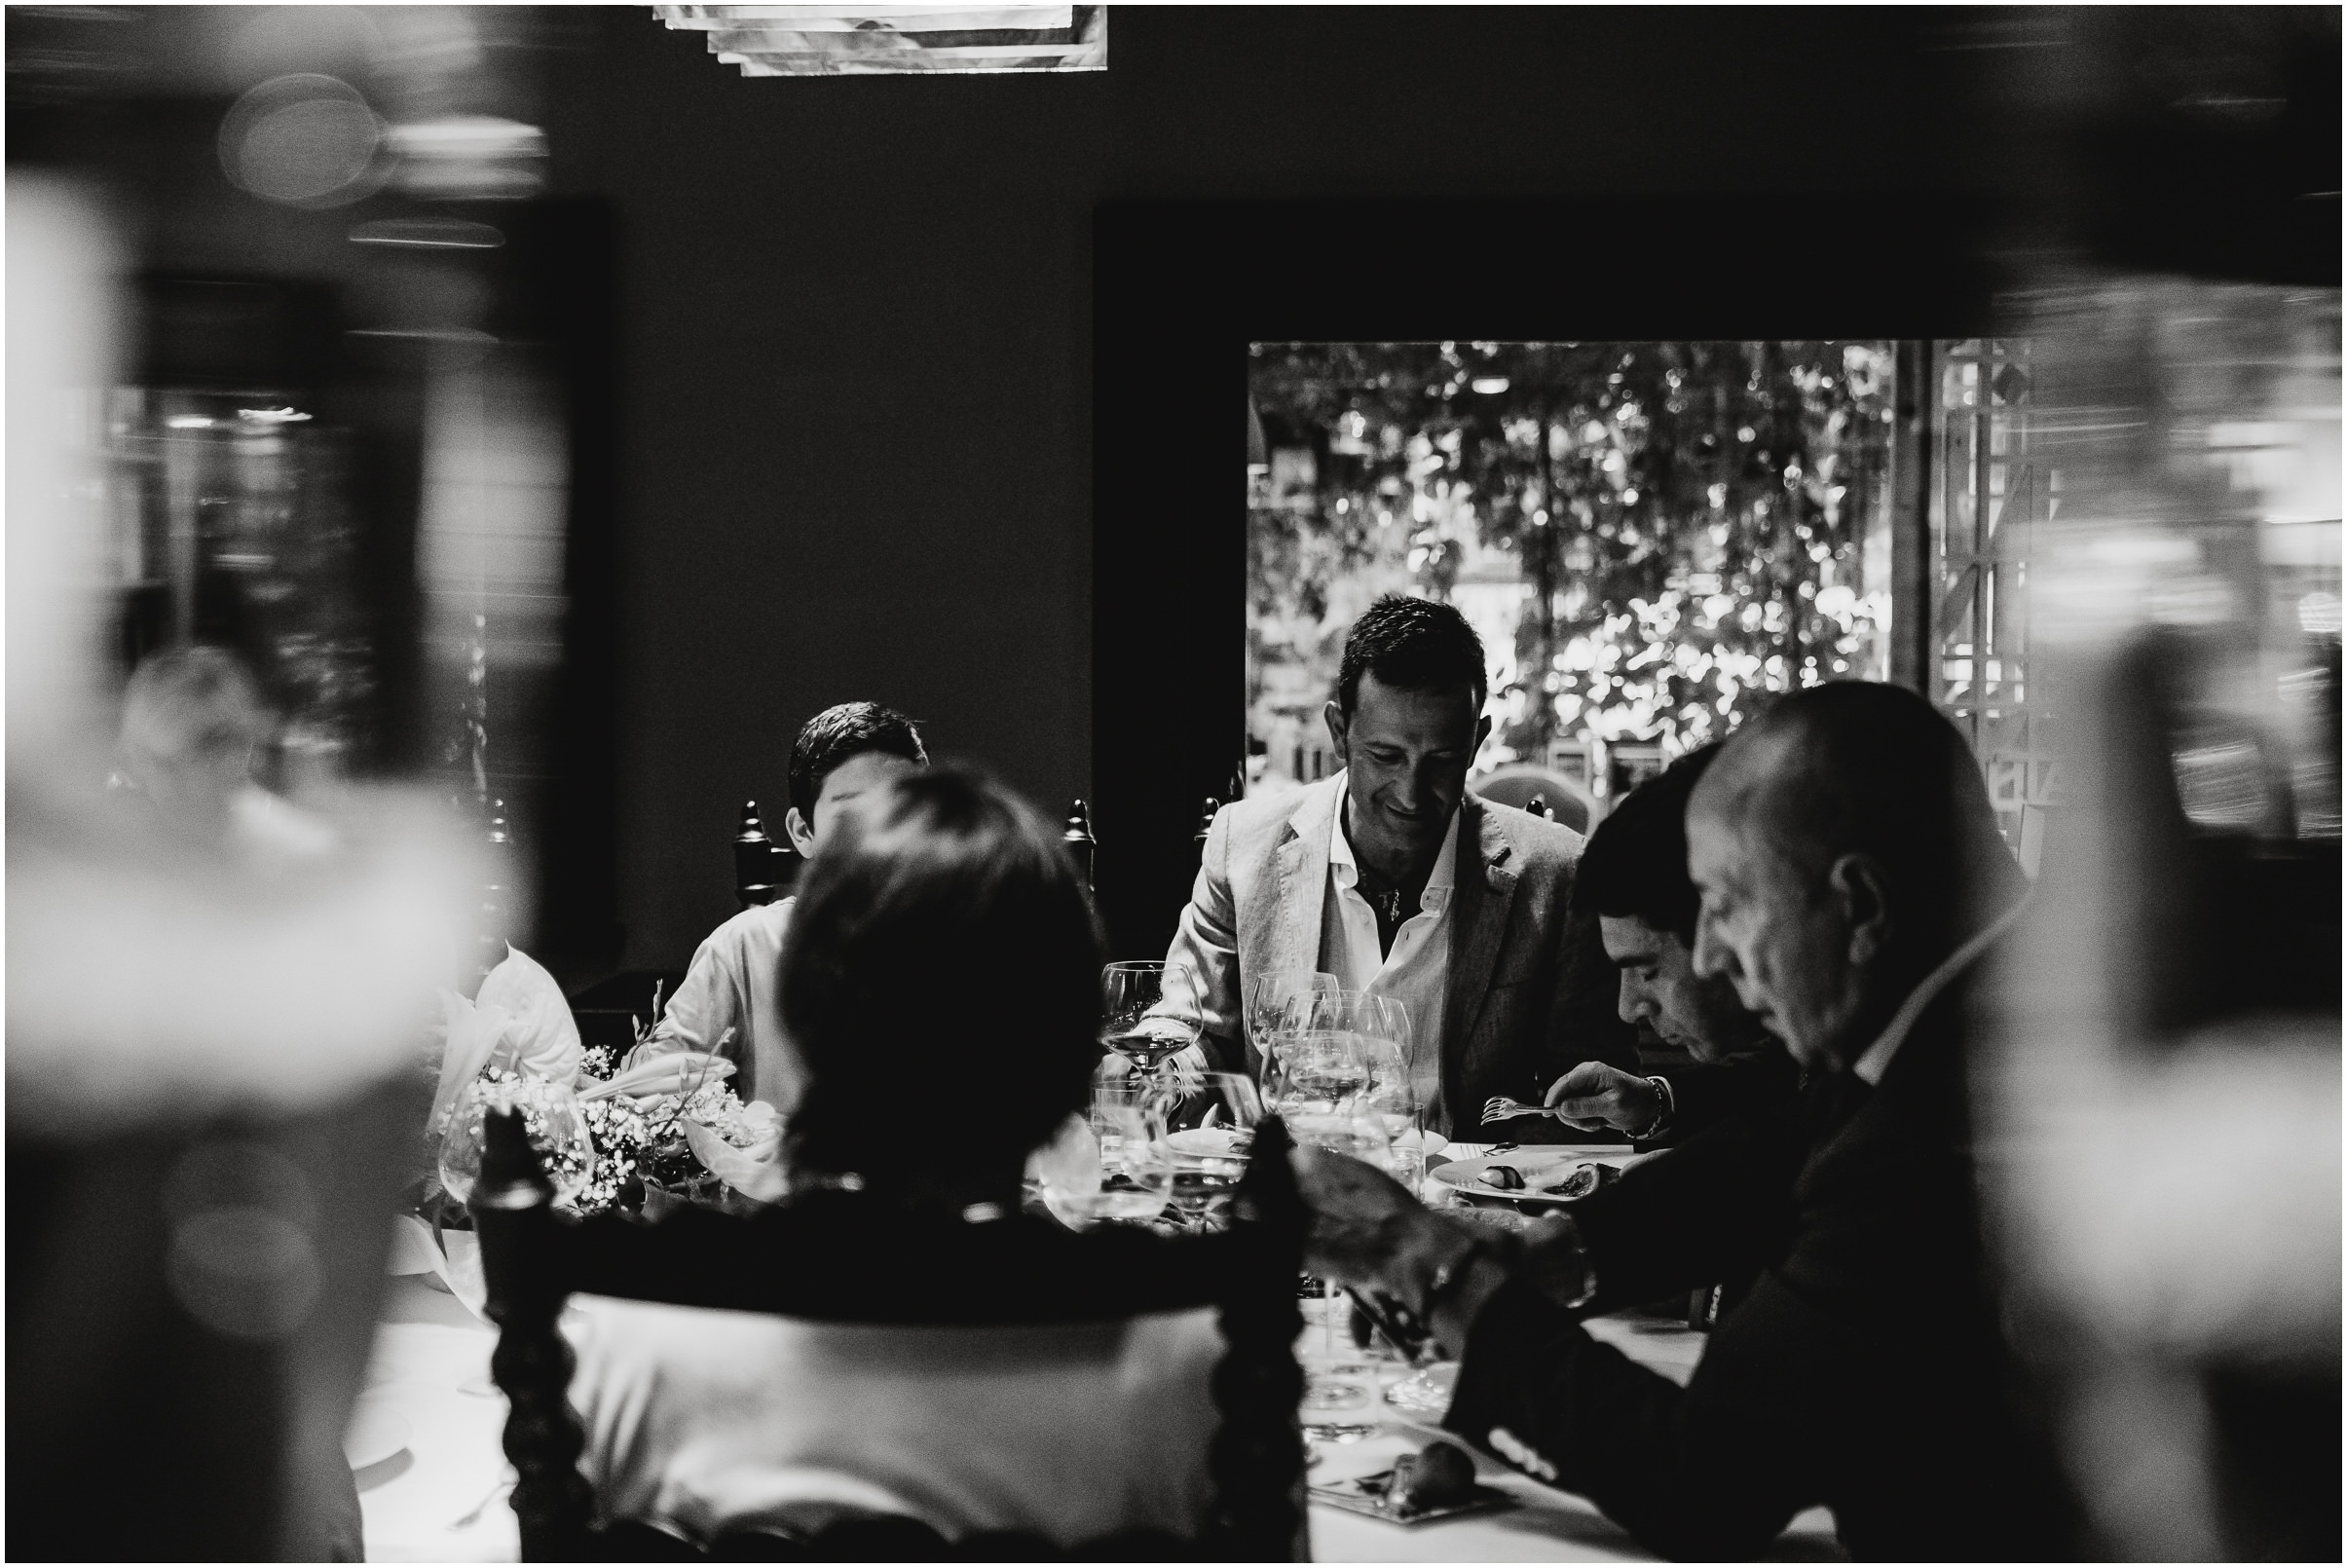 WEDDING-PHOTOGRAPHY-SARA-LORENZONI-FOTOGRAFIA-MATRIMONIO-ORVIETO-JUKA-ANTONELLO58